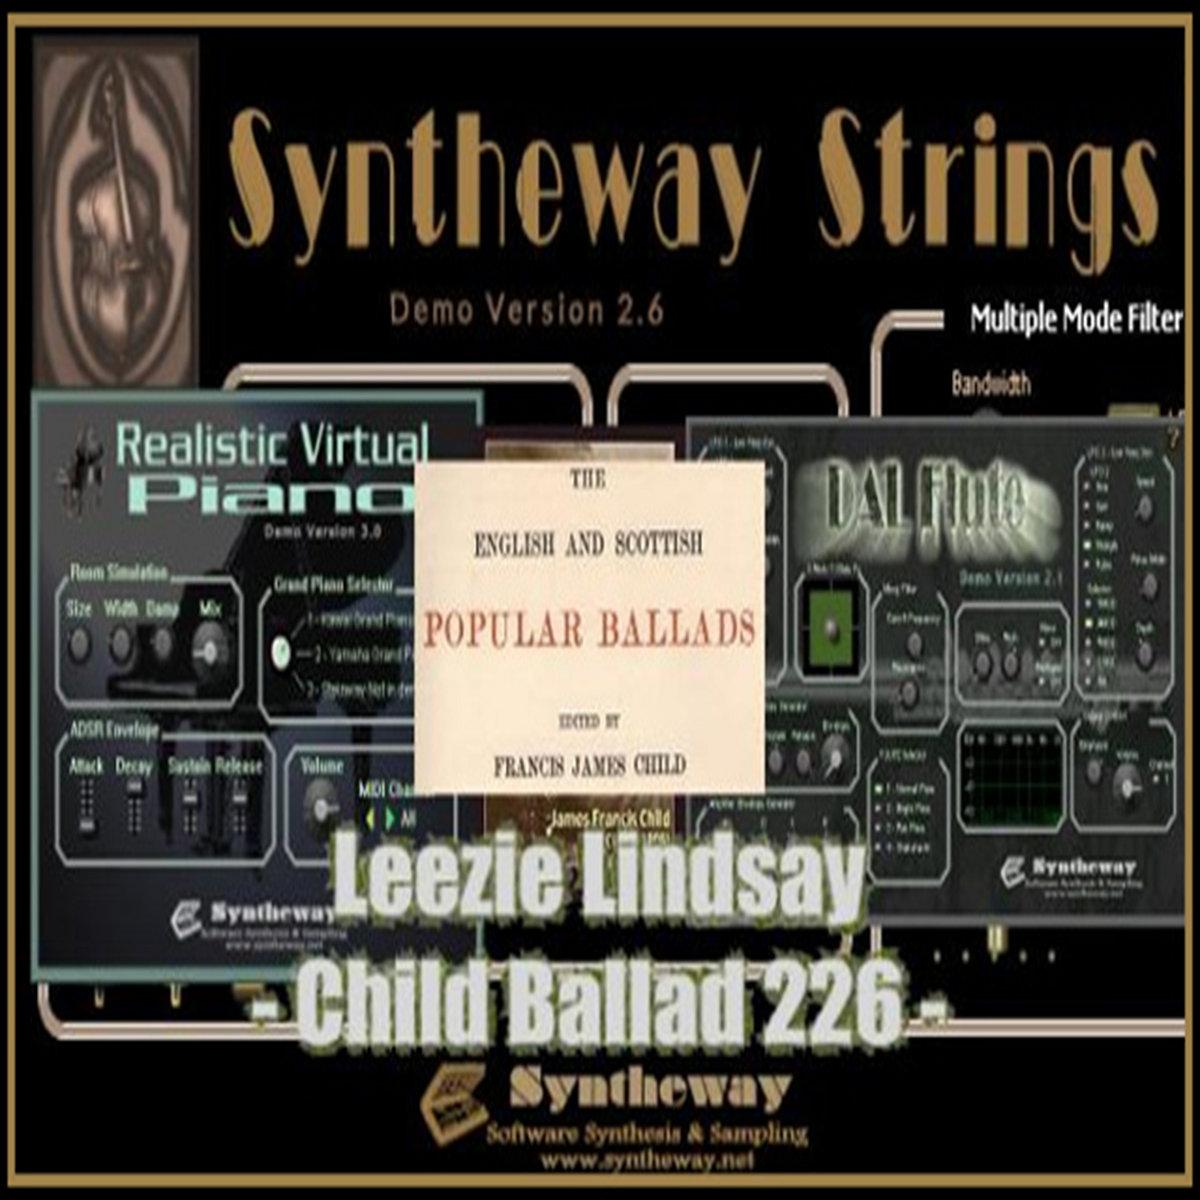 Leezie Lindsay (Child Ballad 226) Syntheway Strings, DAL Flute